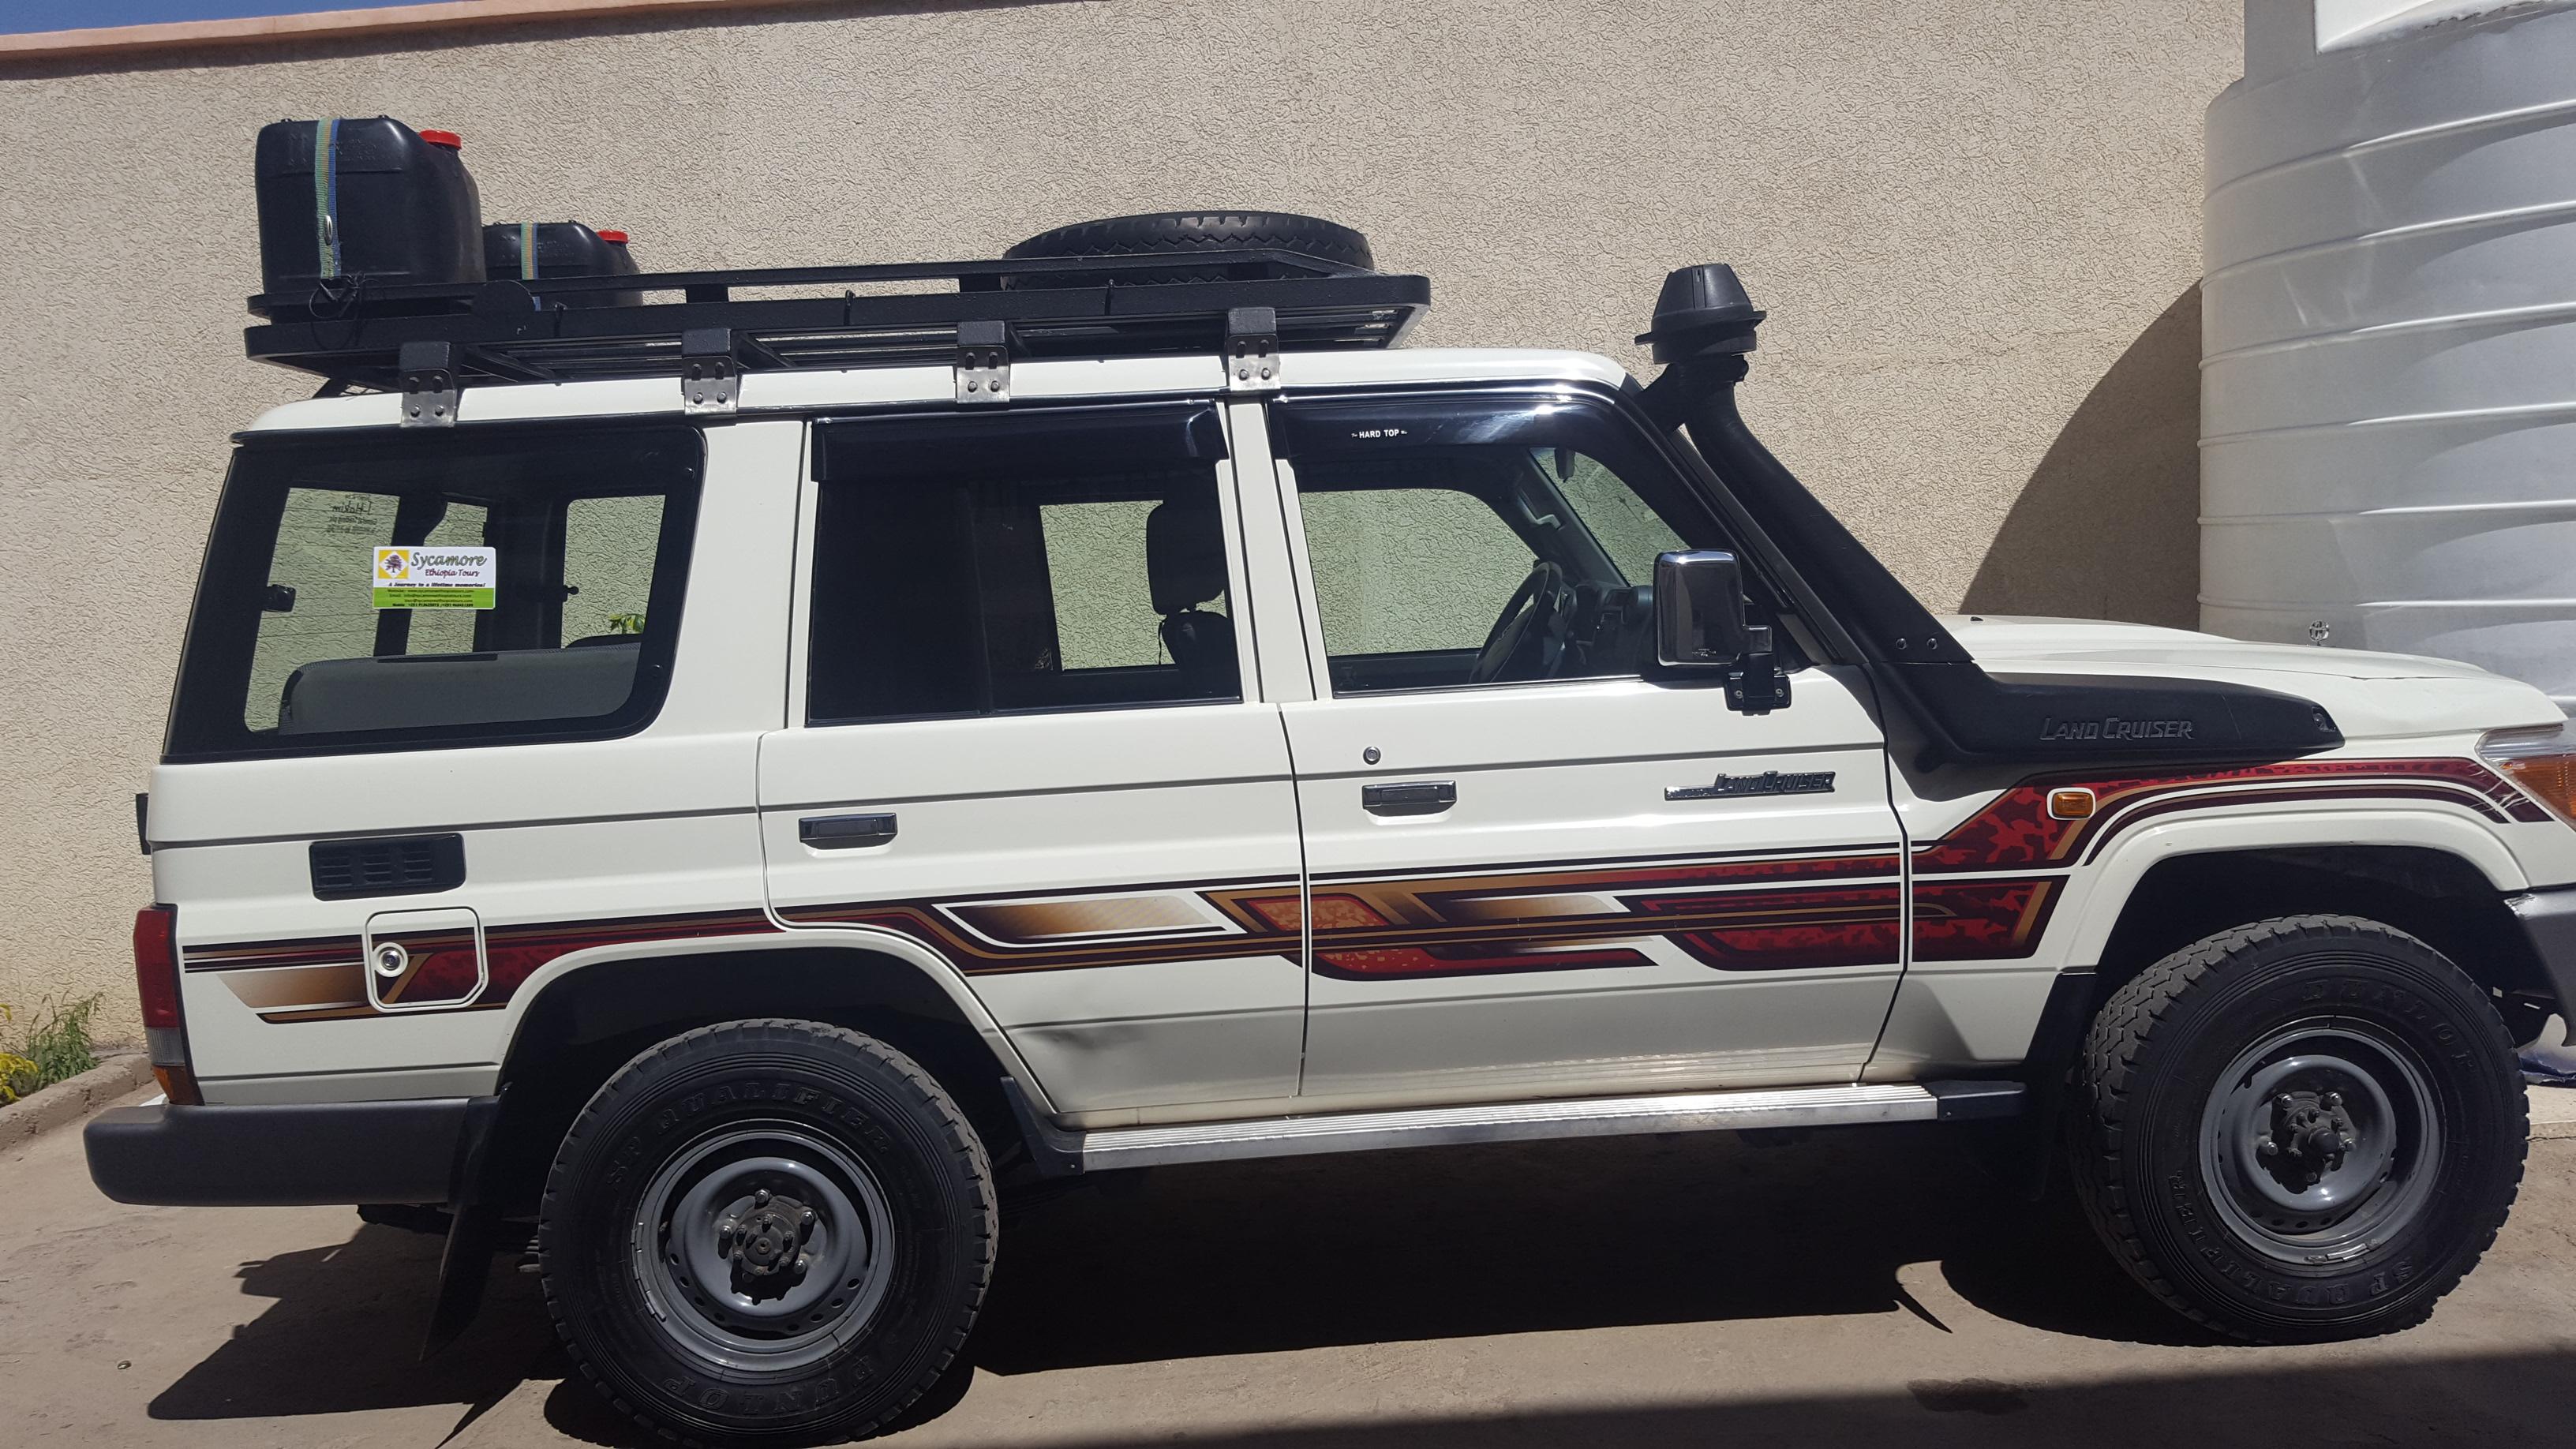 Sycamore 4WD